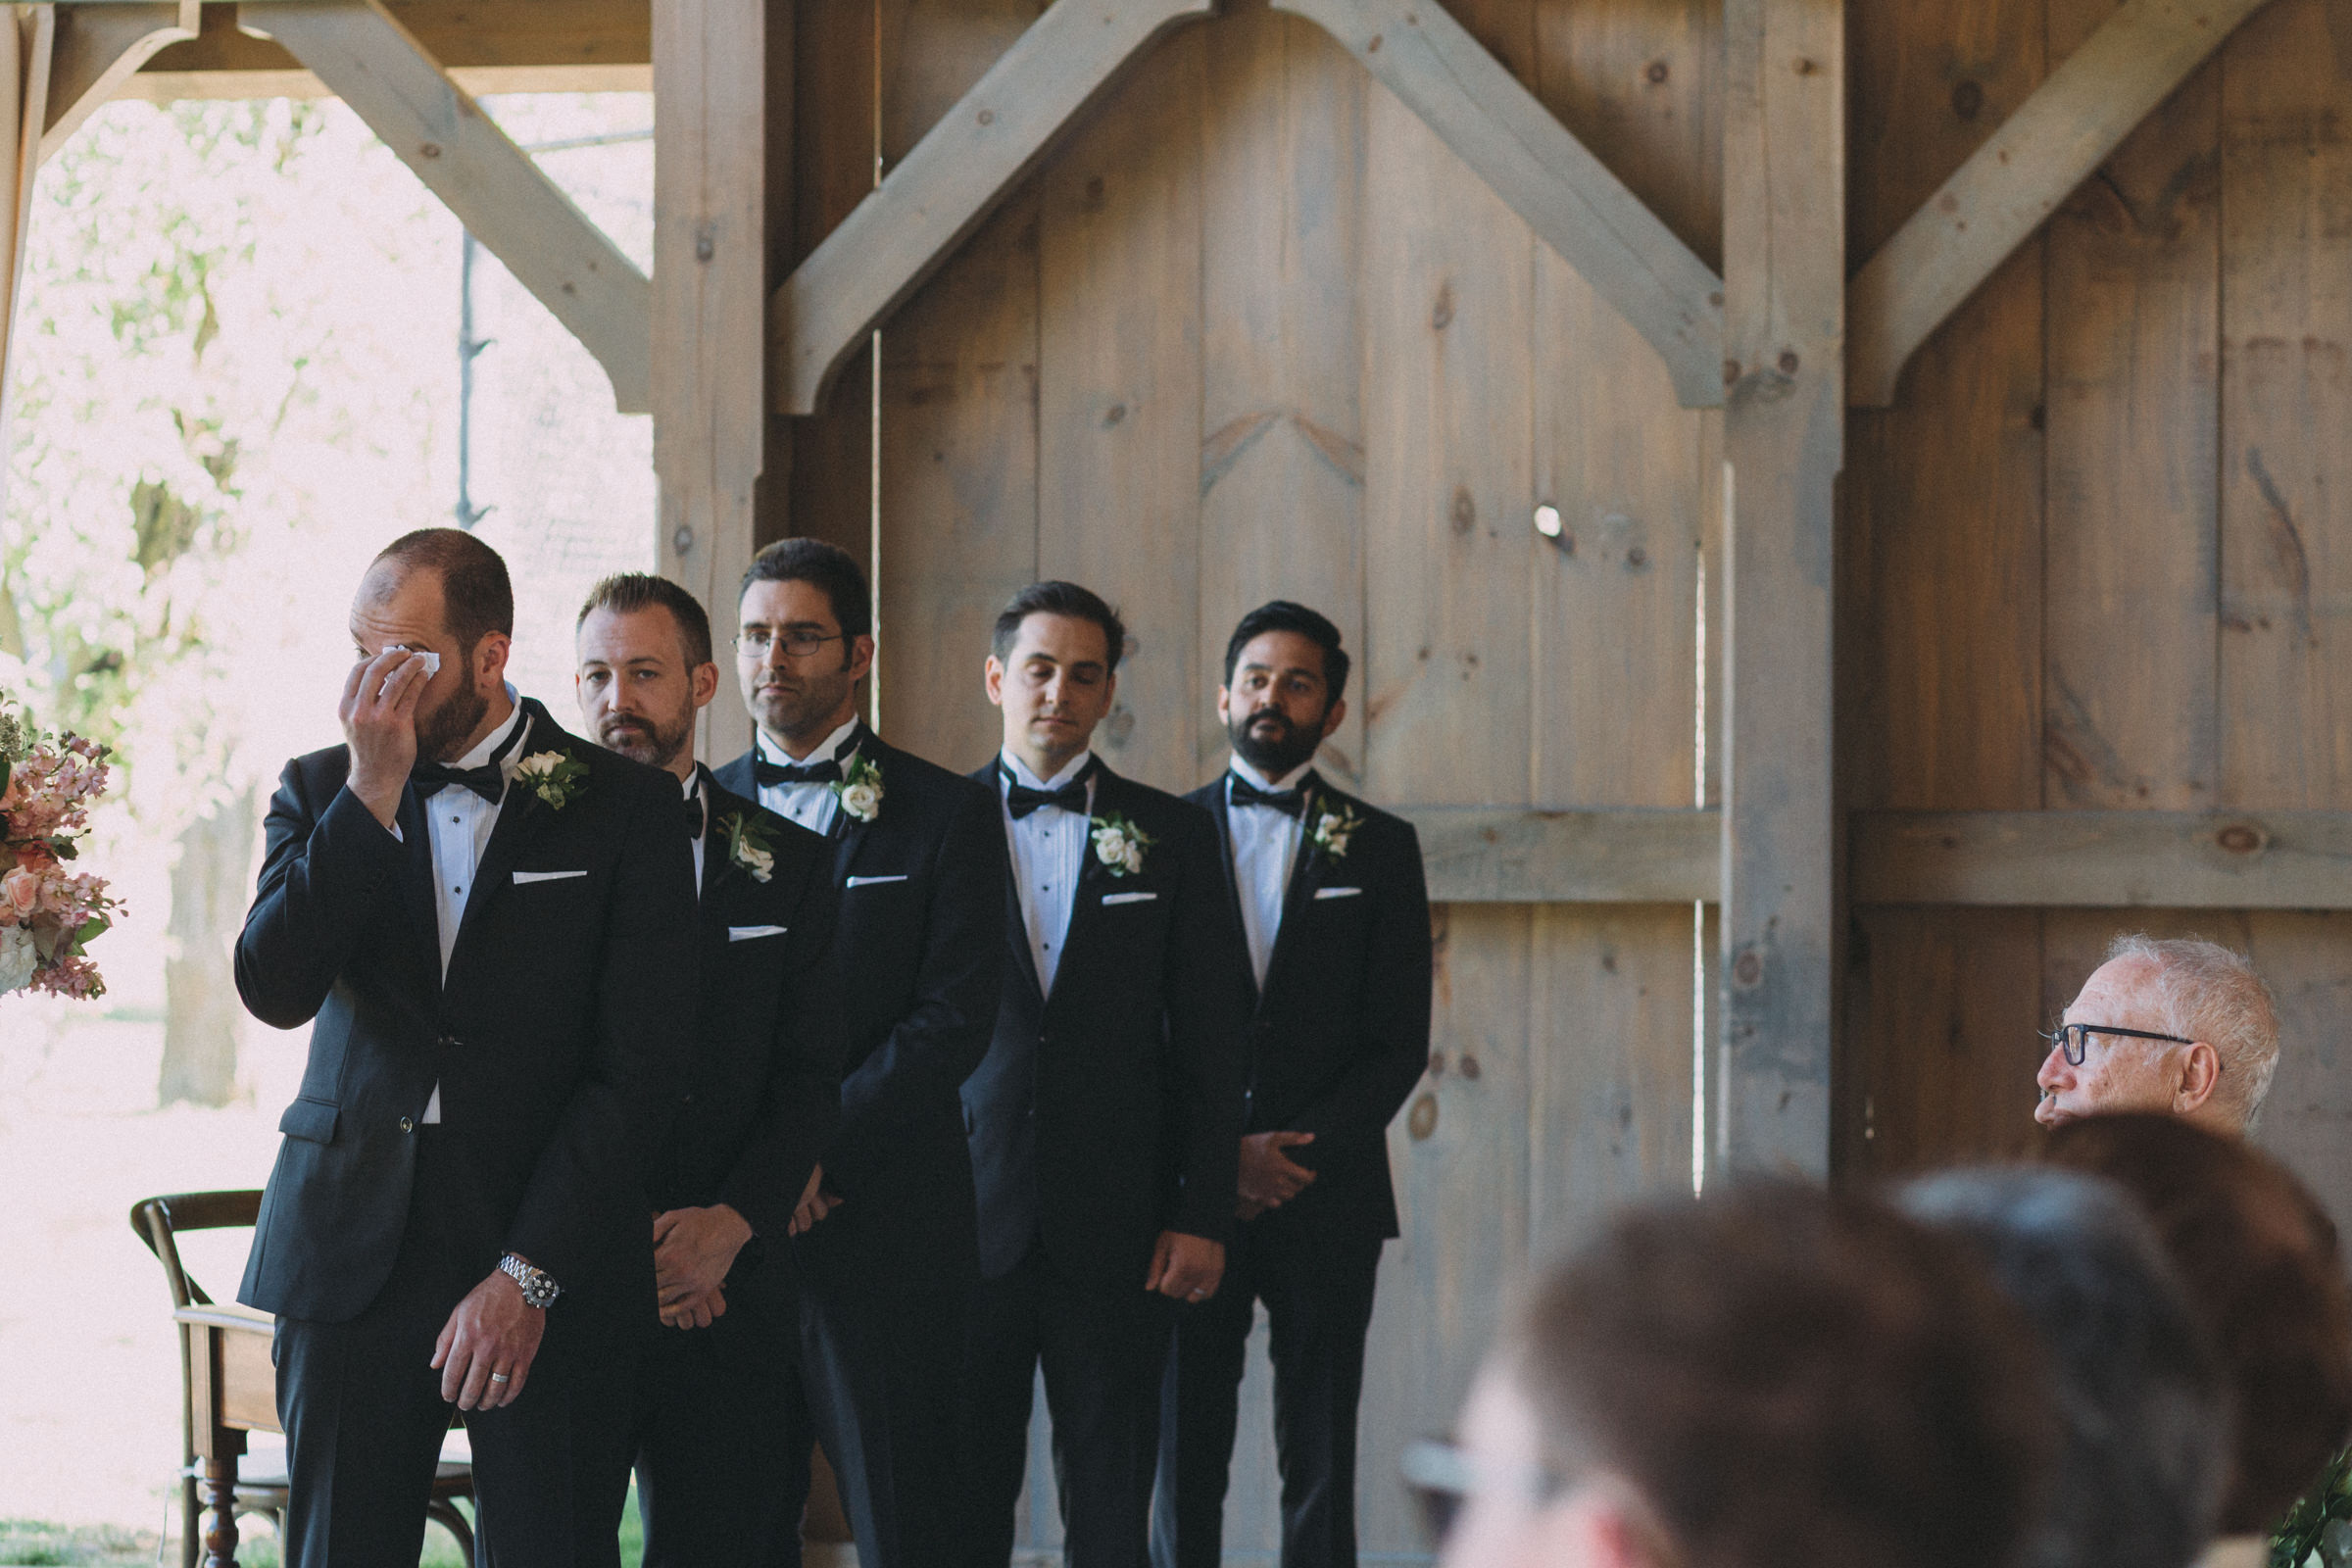 Langdon-Hall-wedding-photography-Cambridge-by-Sam-Wong-of-Visual-Cravings_Sarah-Ryan_38.jpg